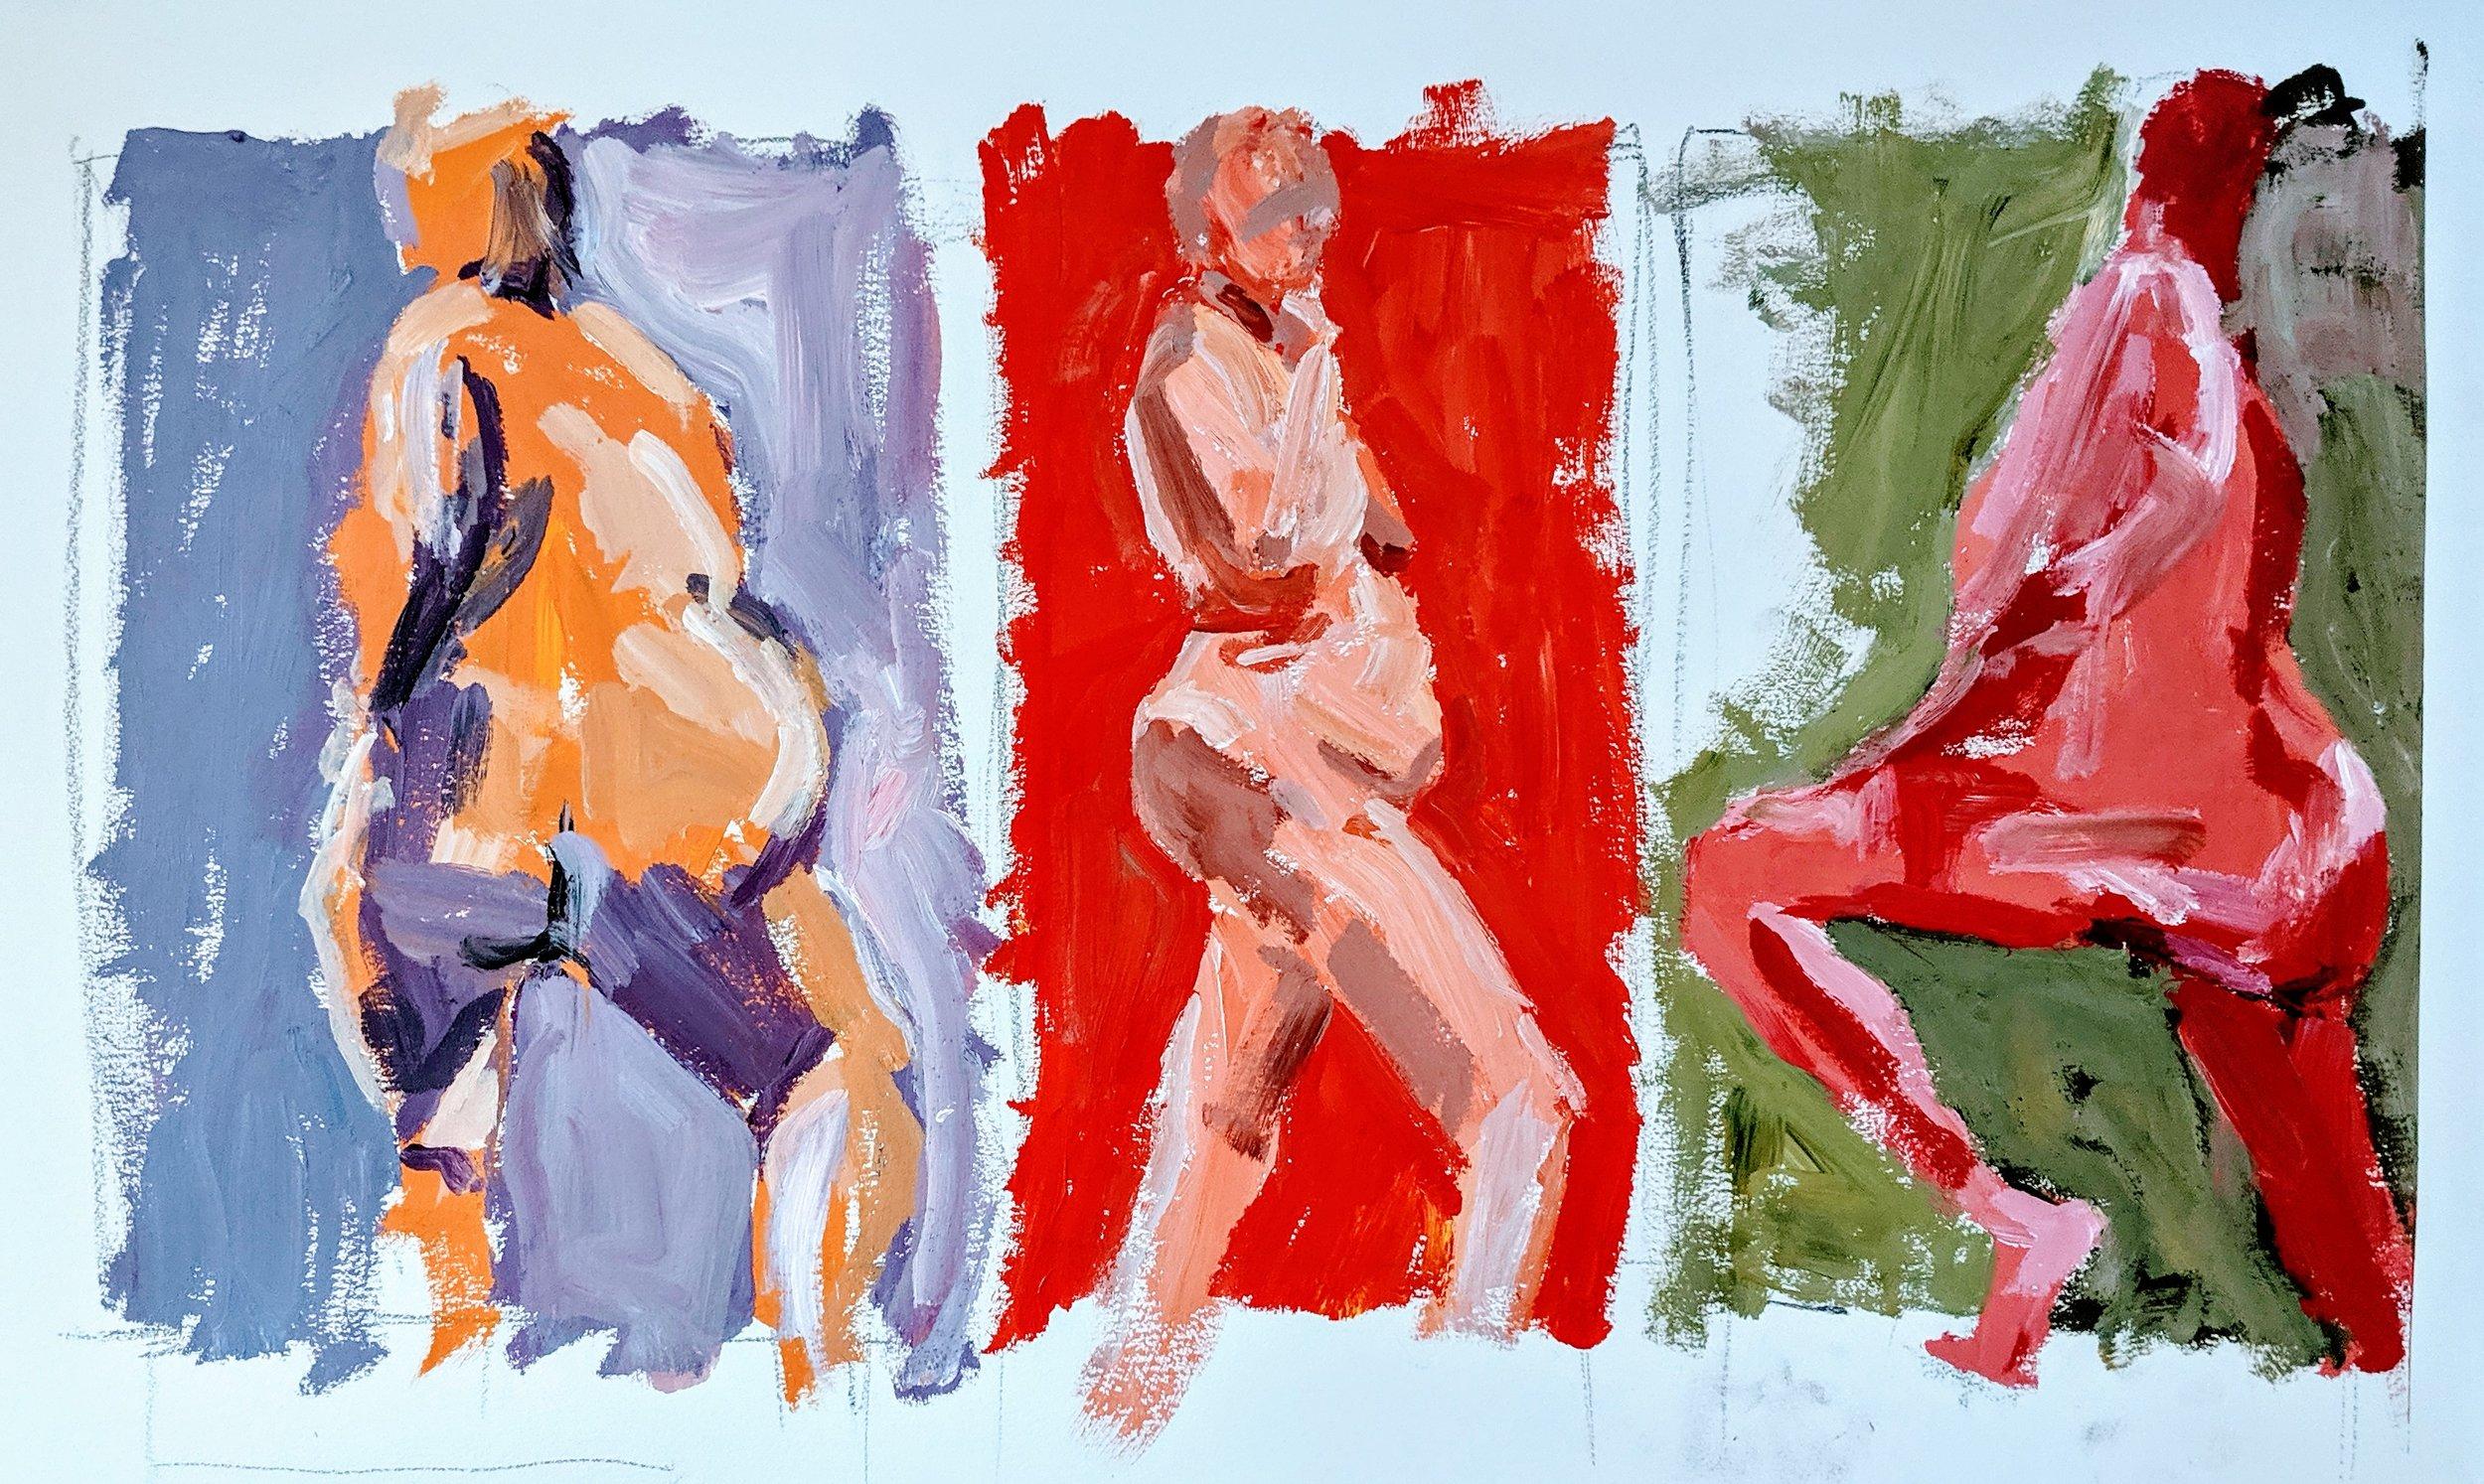 ©2019 Julie Winter | Figure Painting & Drawing Workshop, San Luis Obispo County (Arroyo Grande, CA) | David Limrite, Instructor